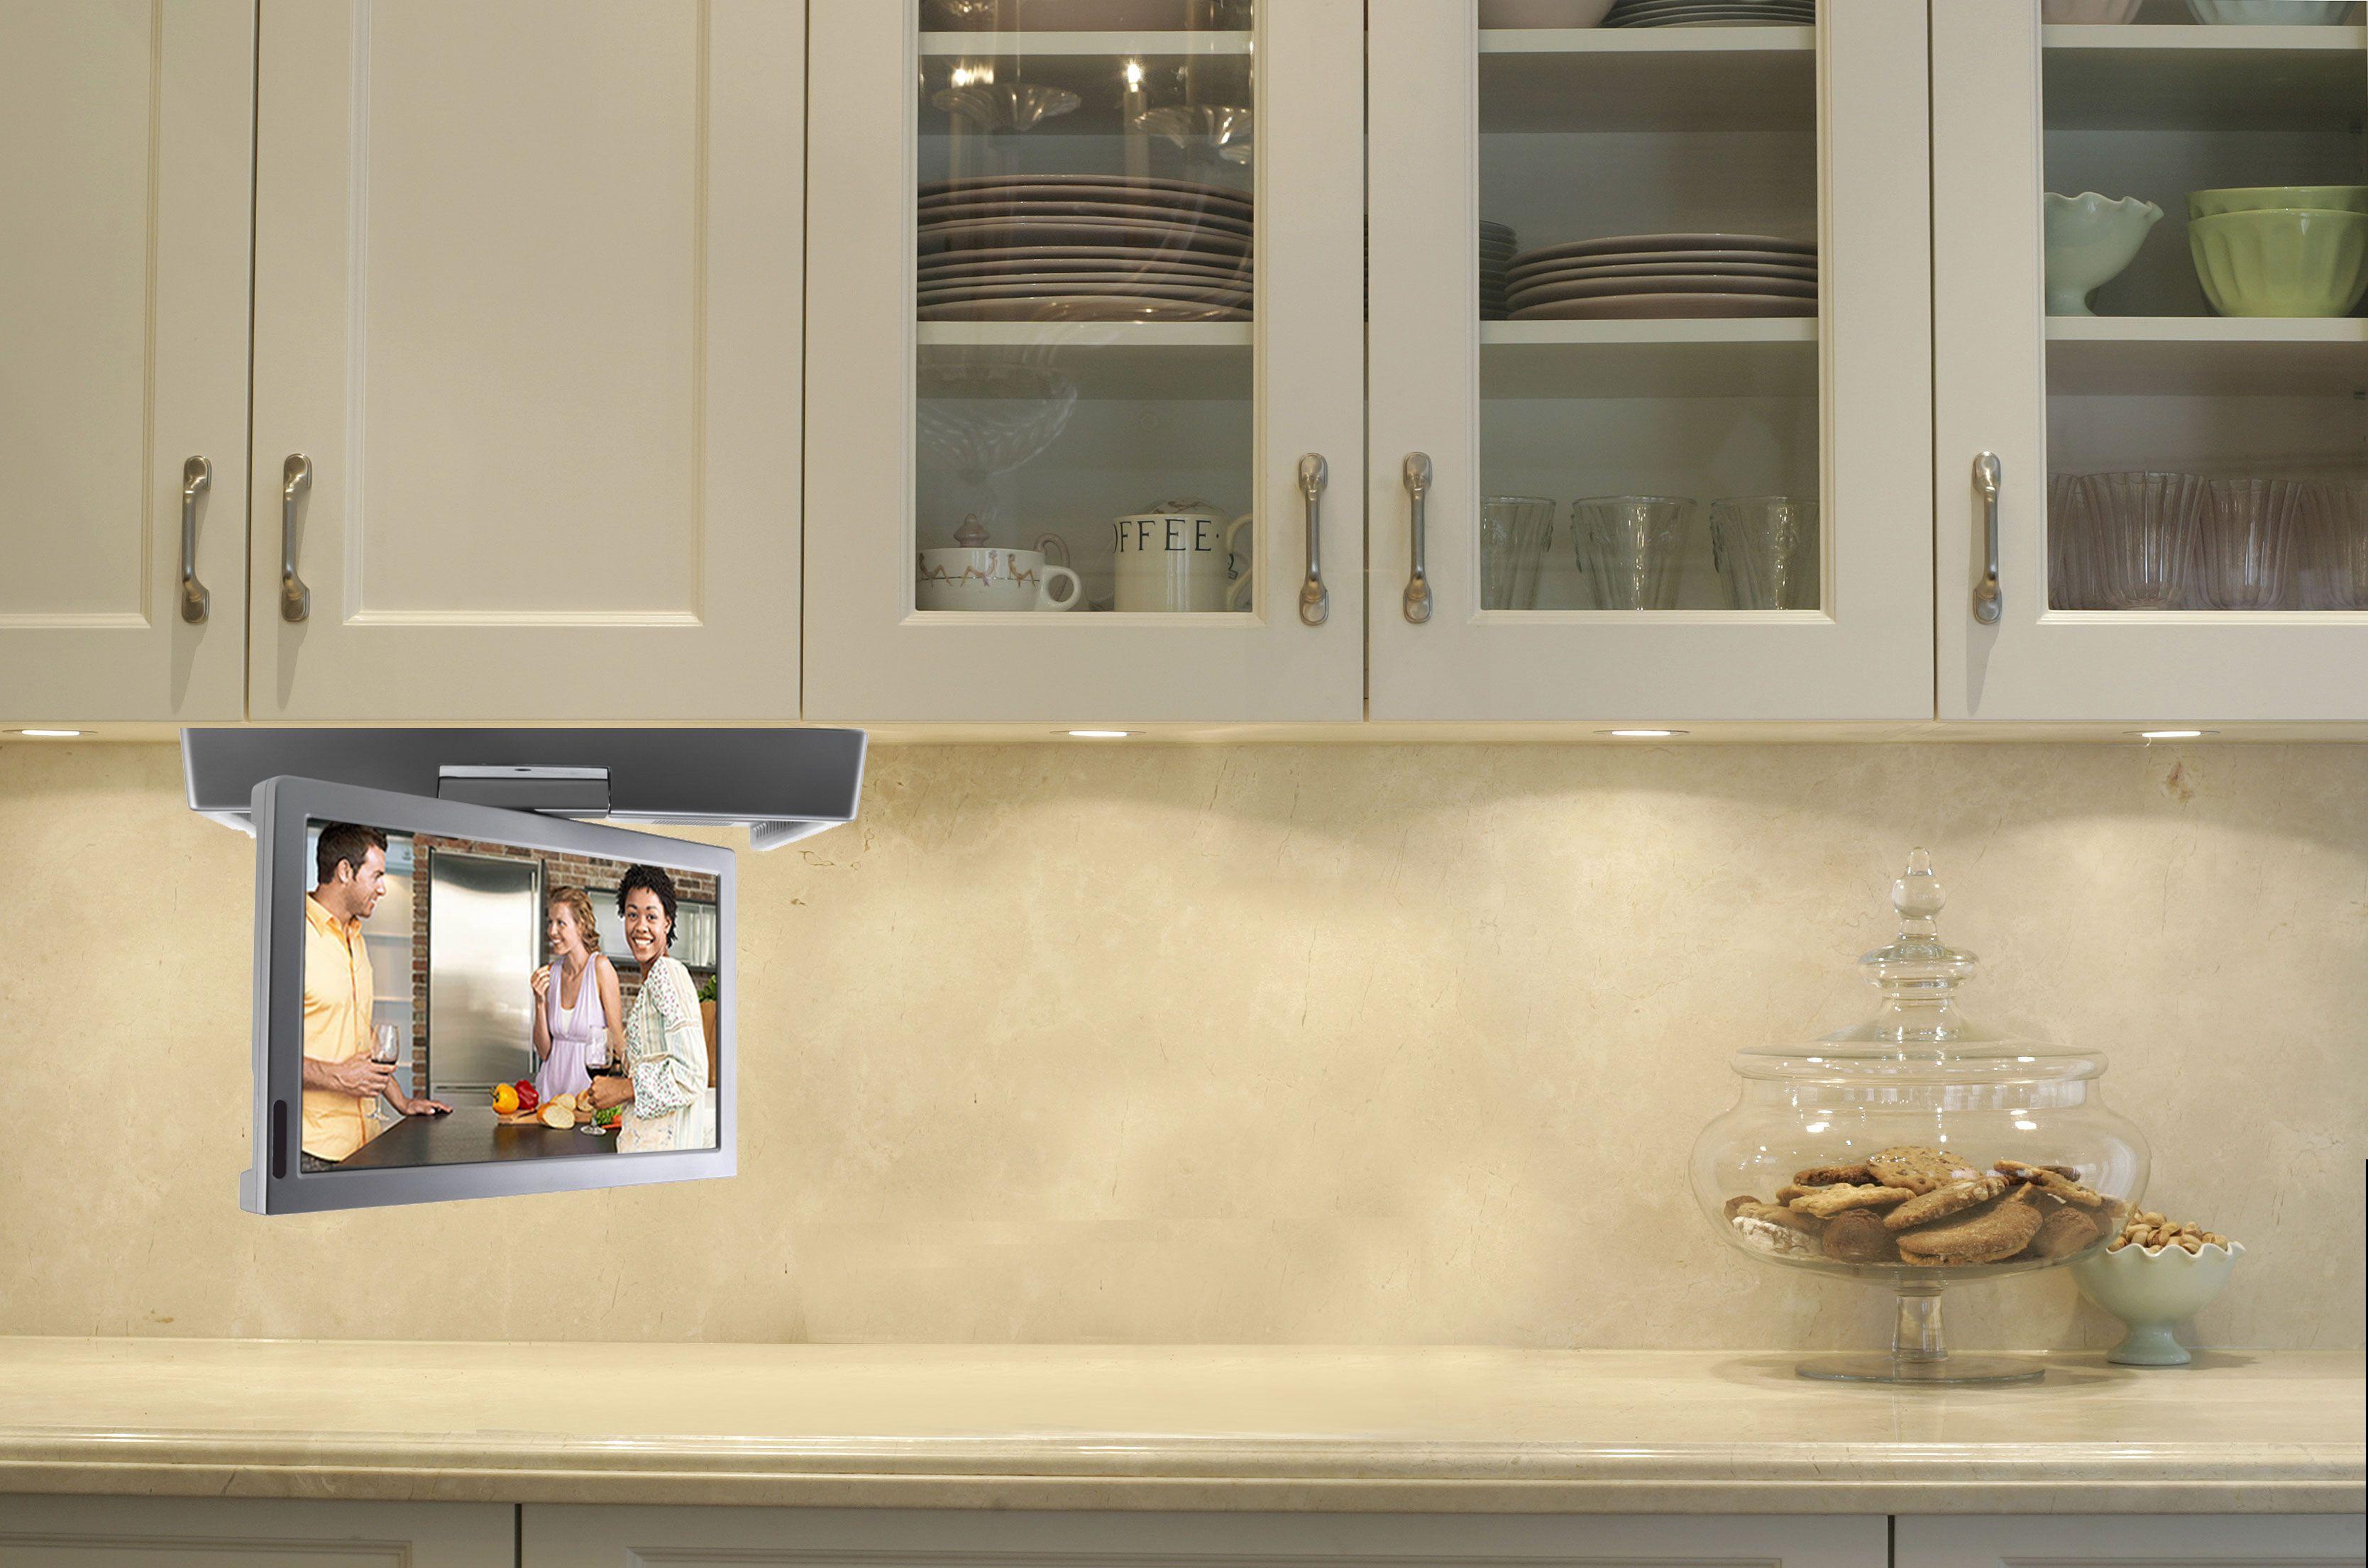 Pop out kitchen window  silver flipdown kitchen tv  kitchen tvs  flipdown tv pop up tv